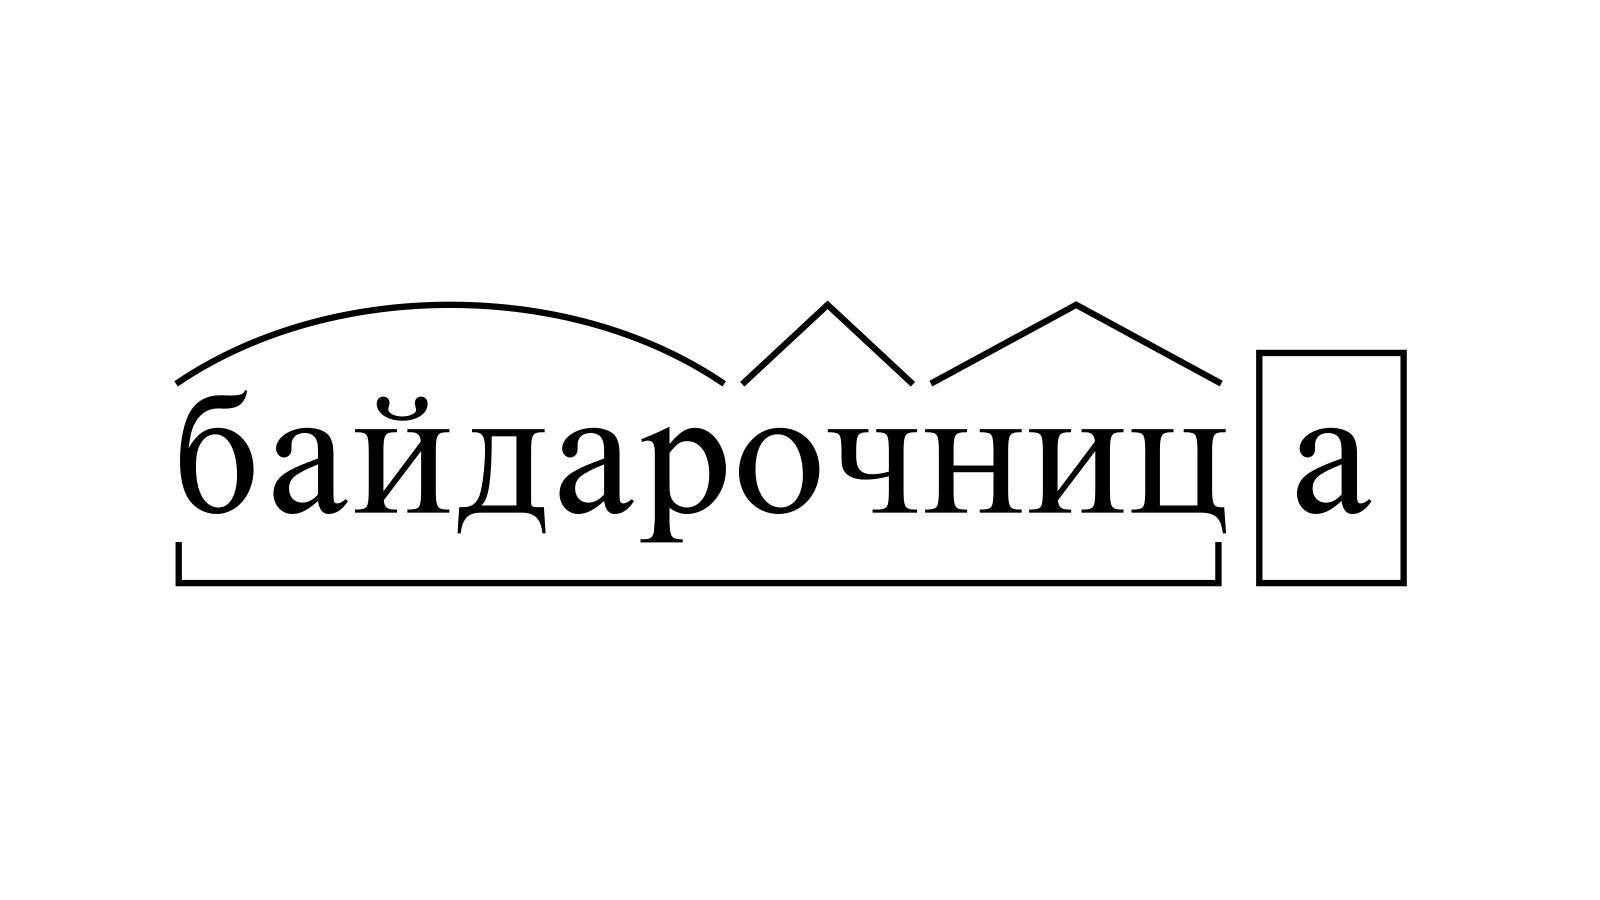 Разбор слова «байдарочница» по составу